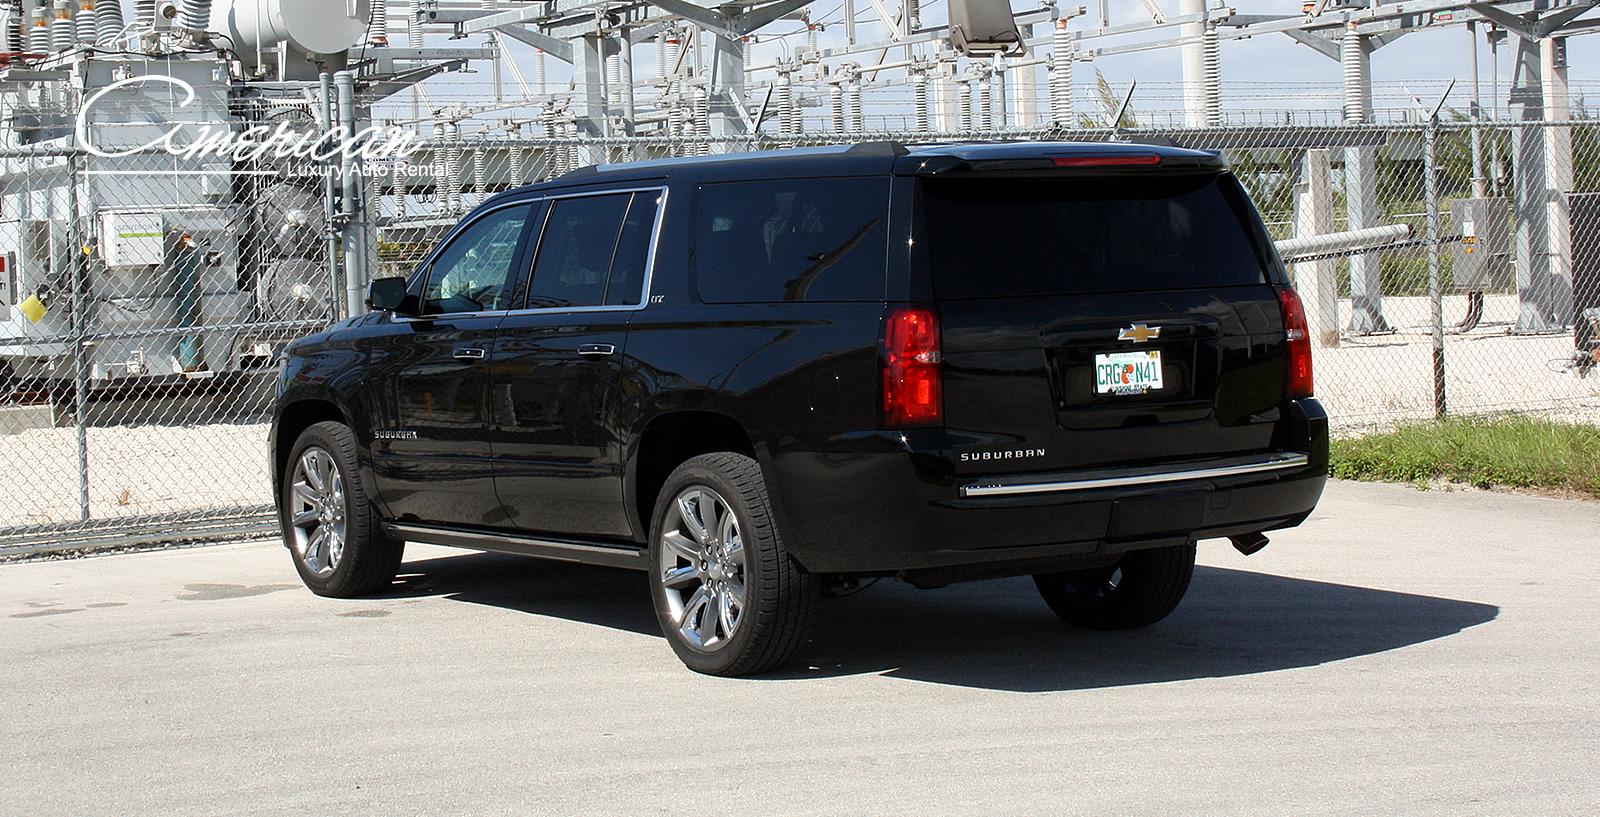 Chevrolet Suburban Ltz Rental In Orlando And Miami